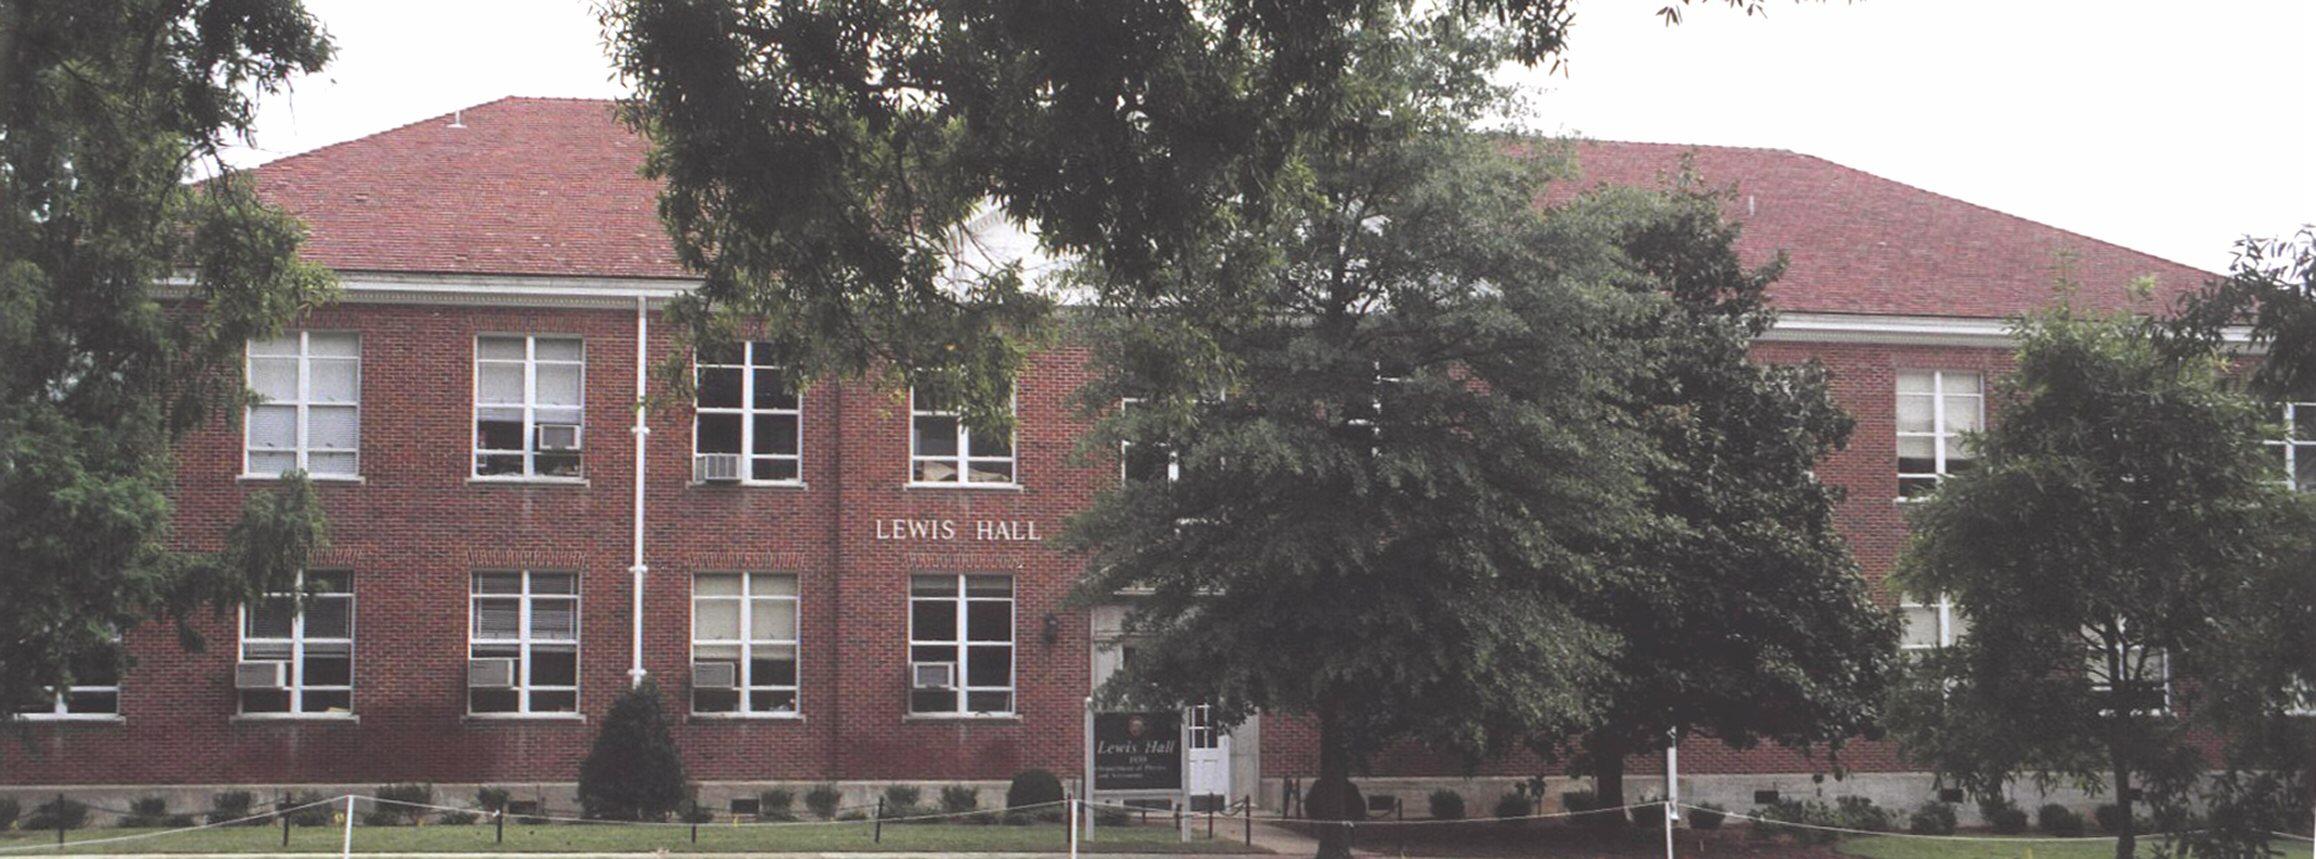 Lewis Hall, north side